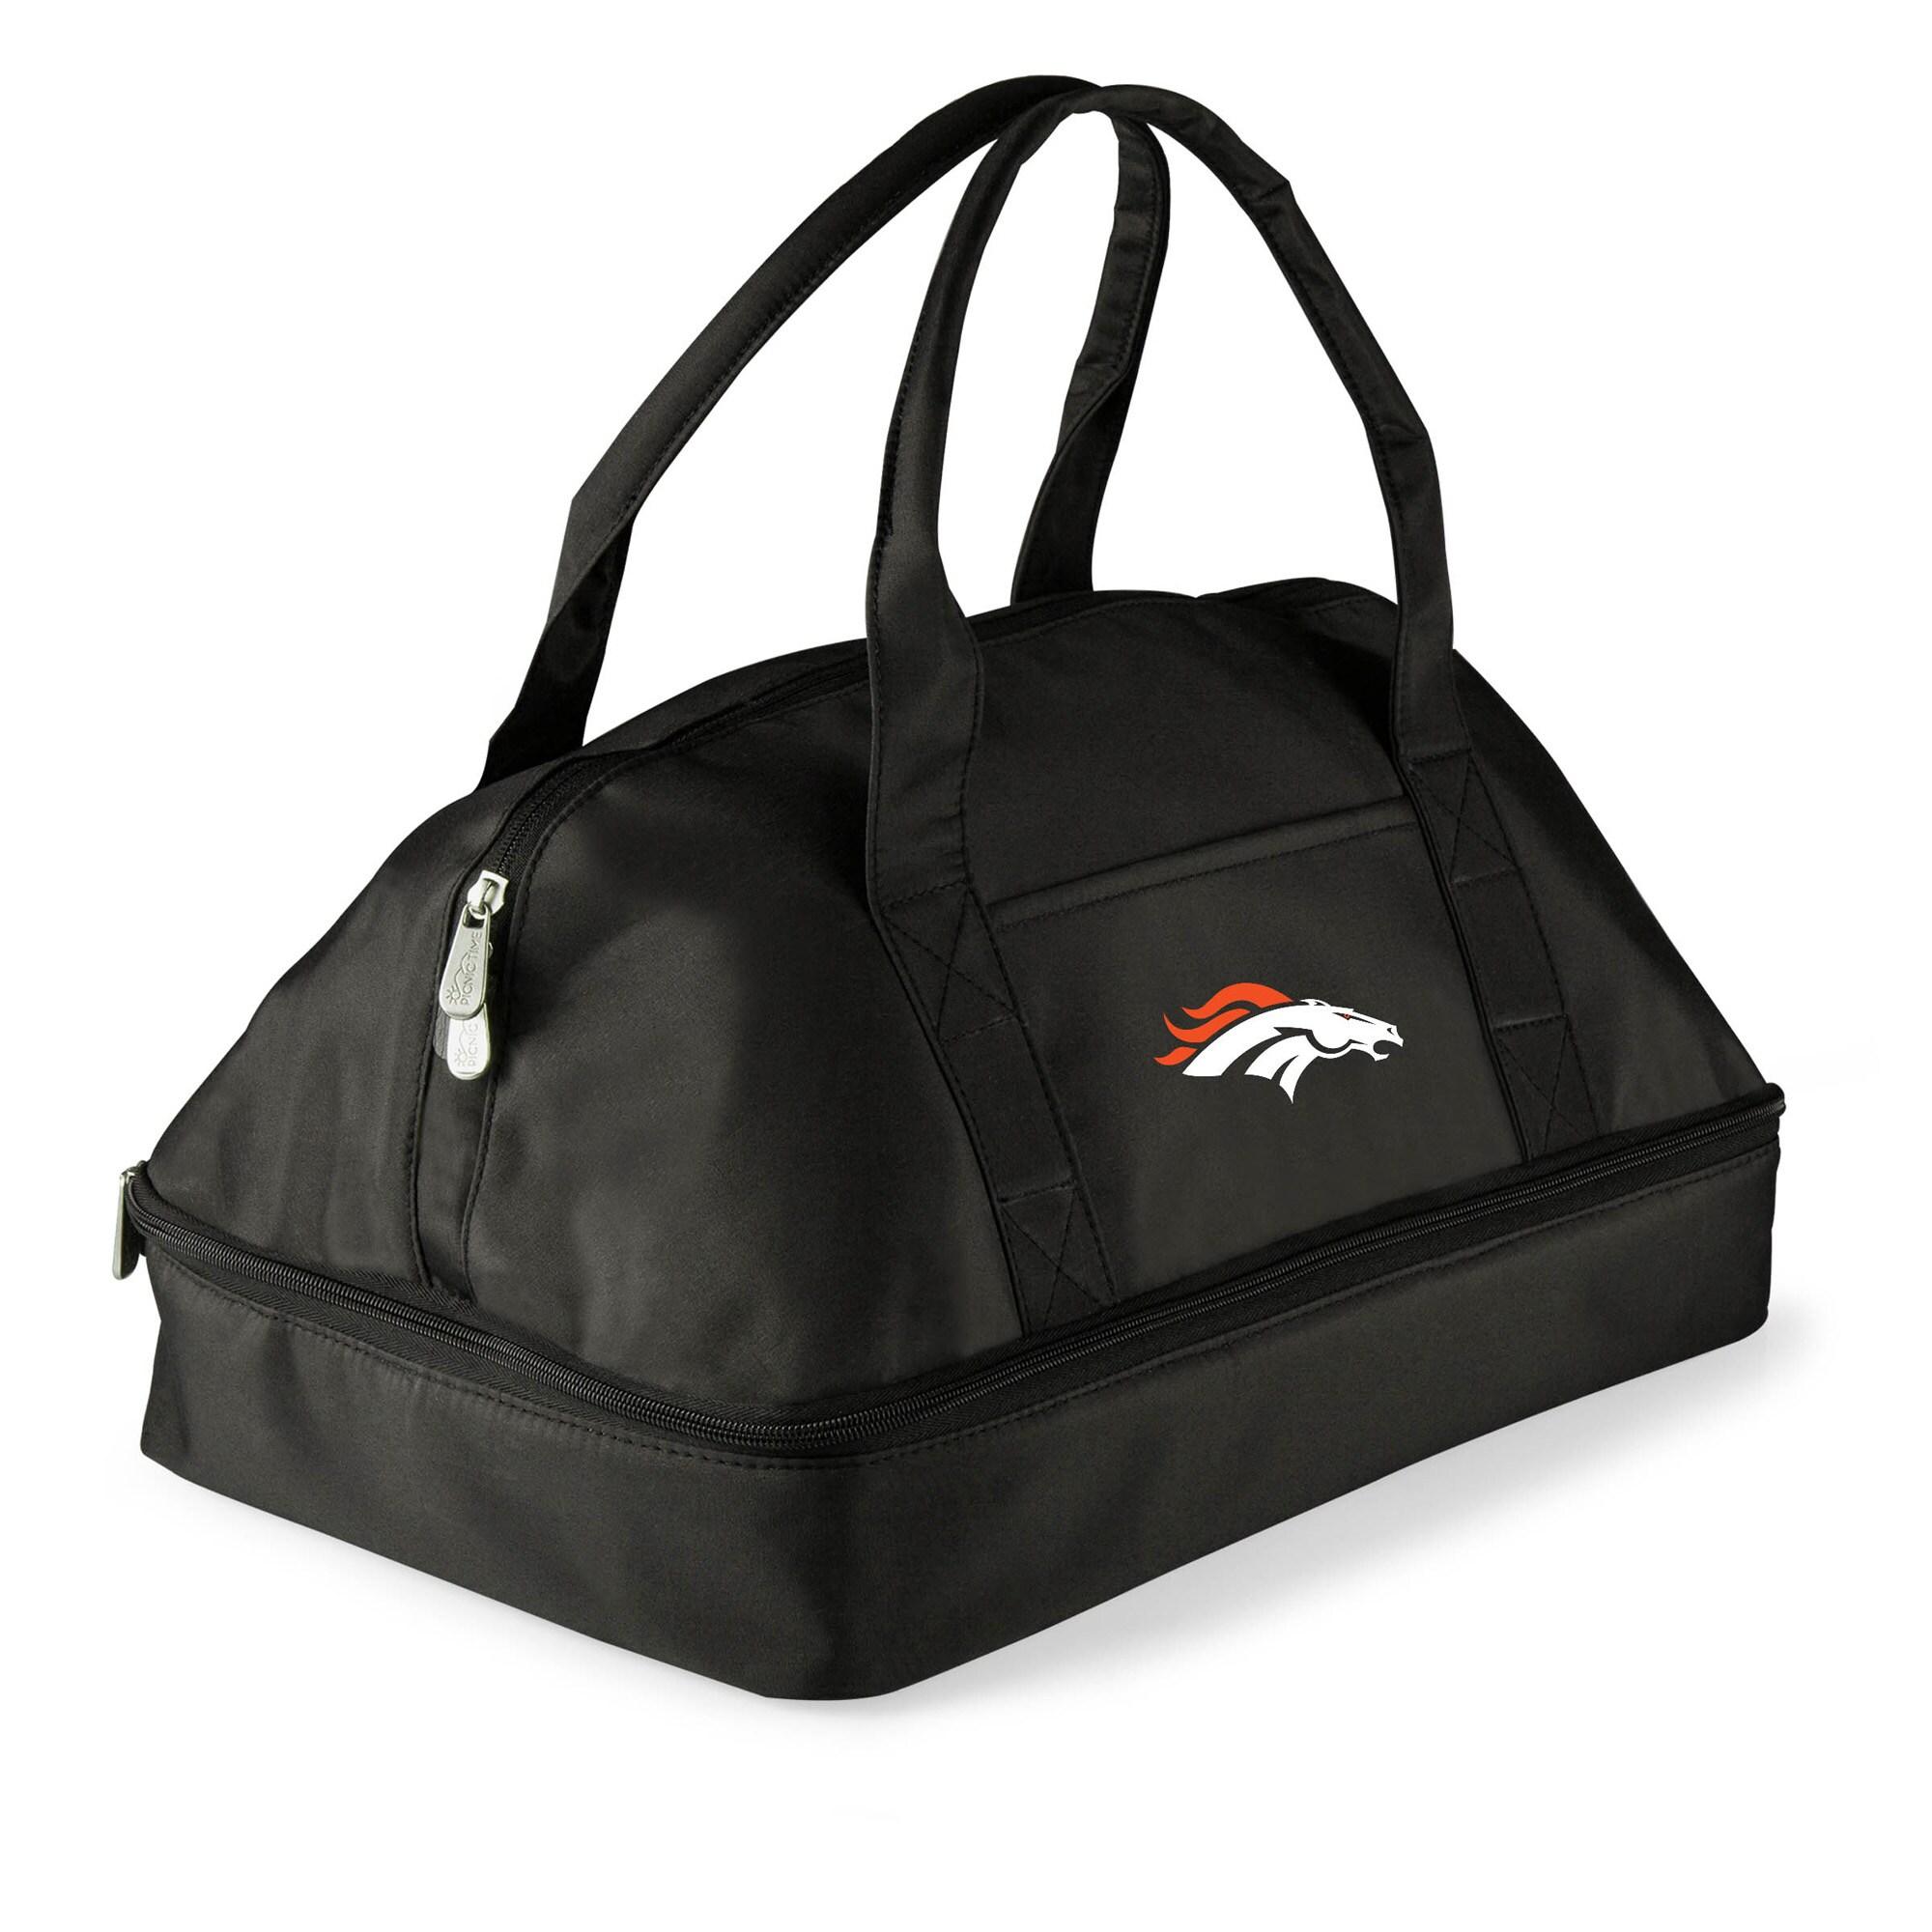 Denver Broncos Potluck Casserole Tote - Black